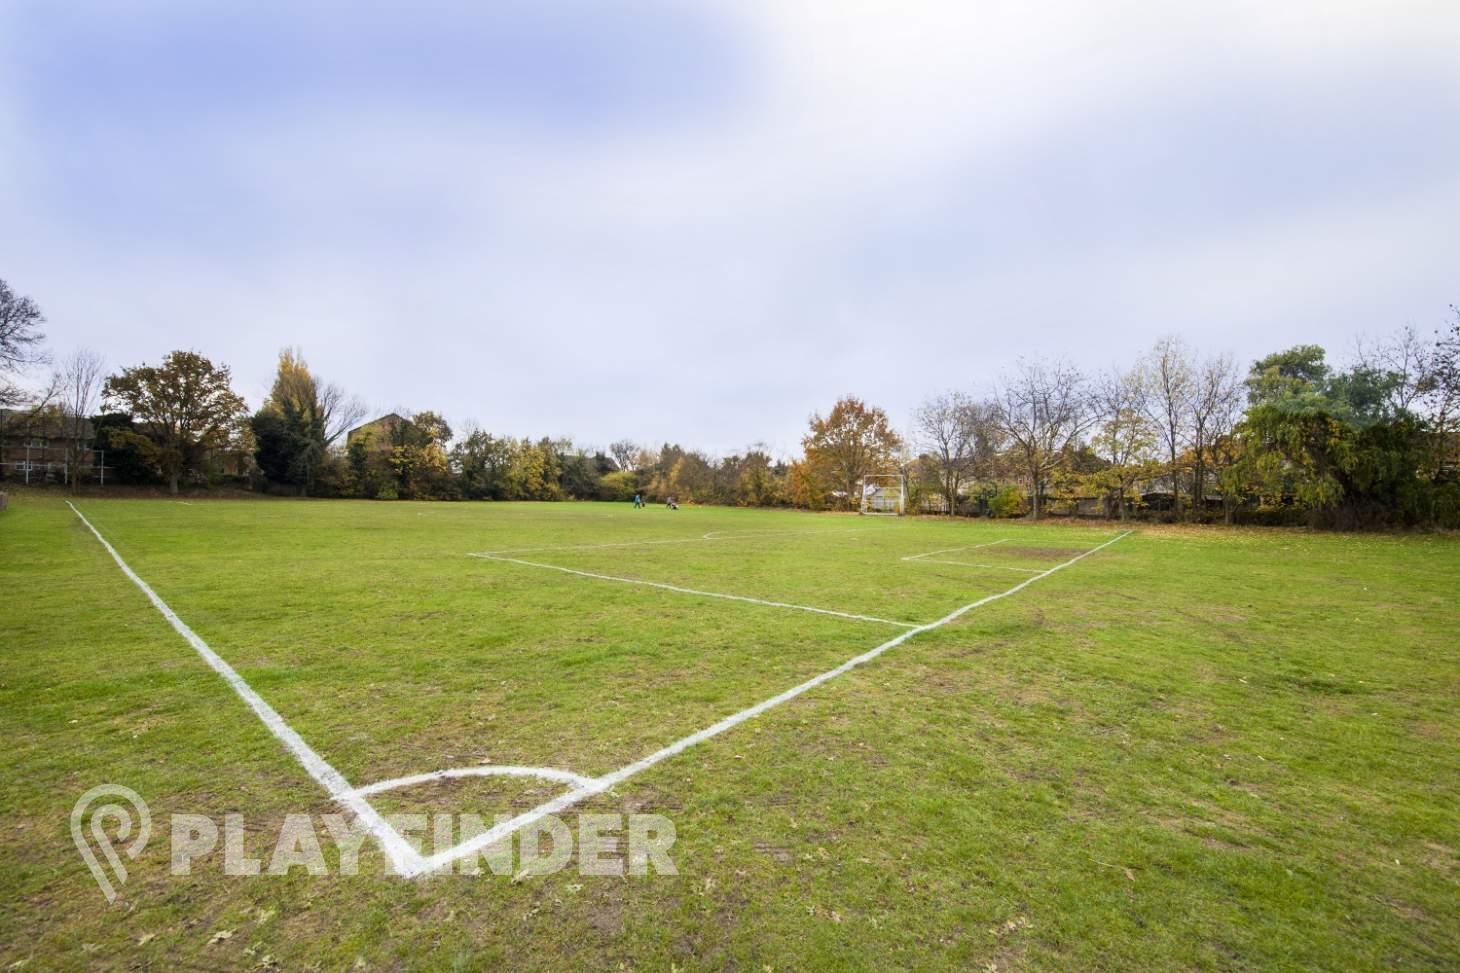 Rolls Sports Ground 9 a side   Grass football pitch